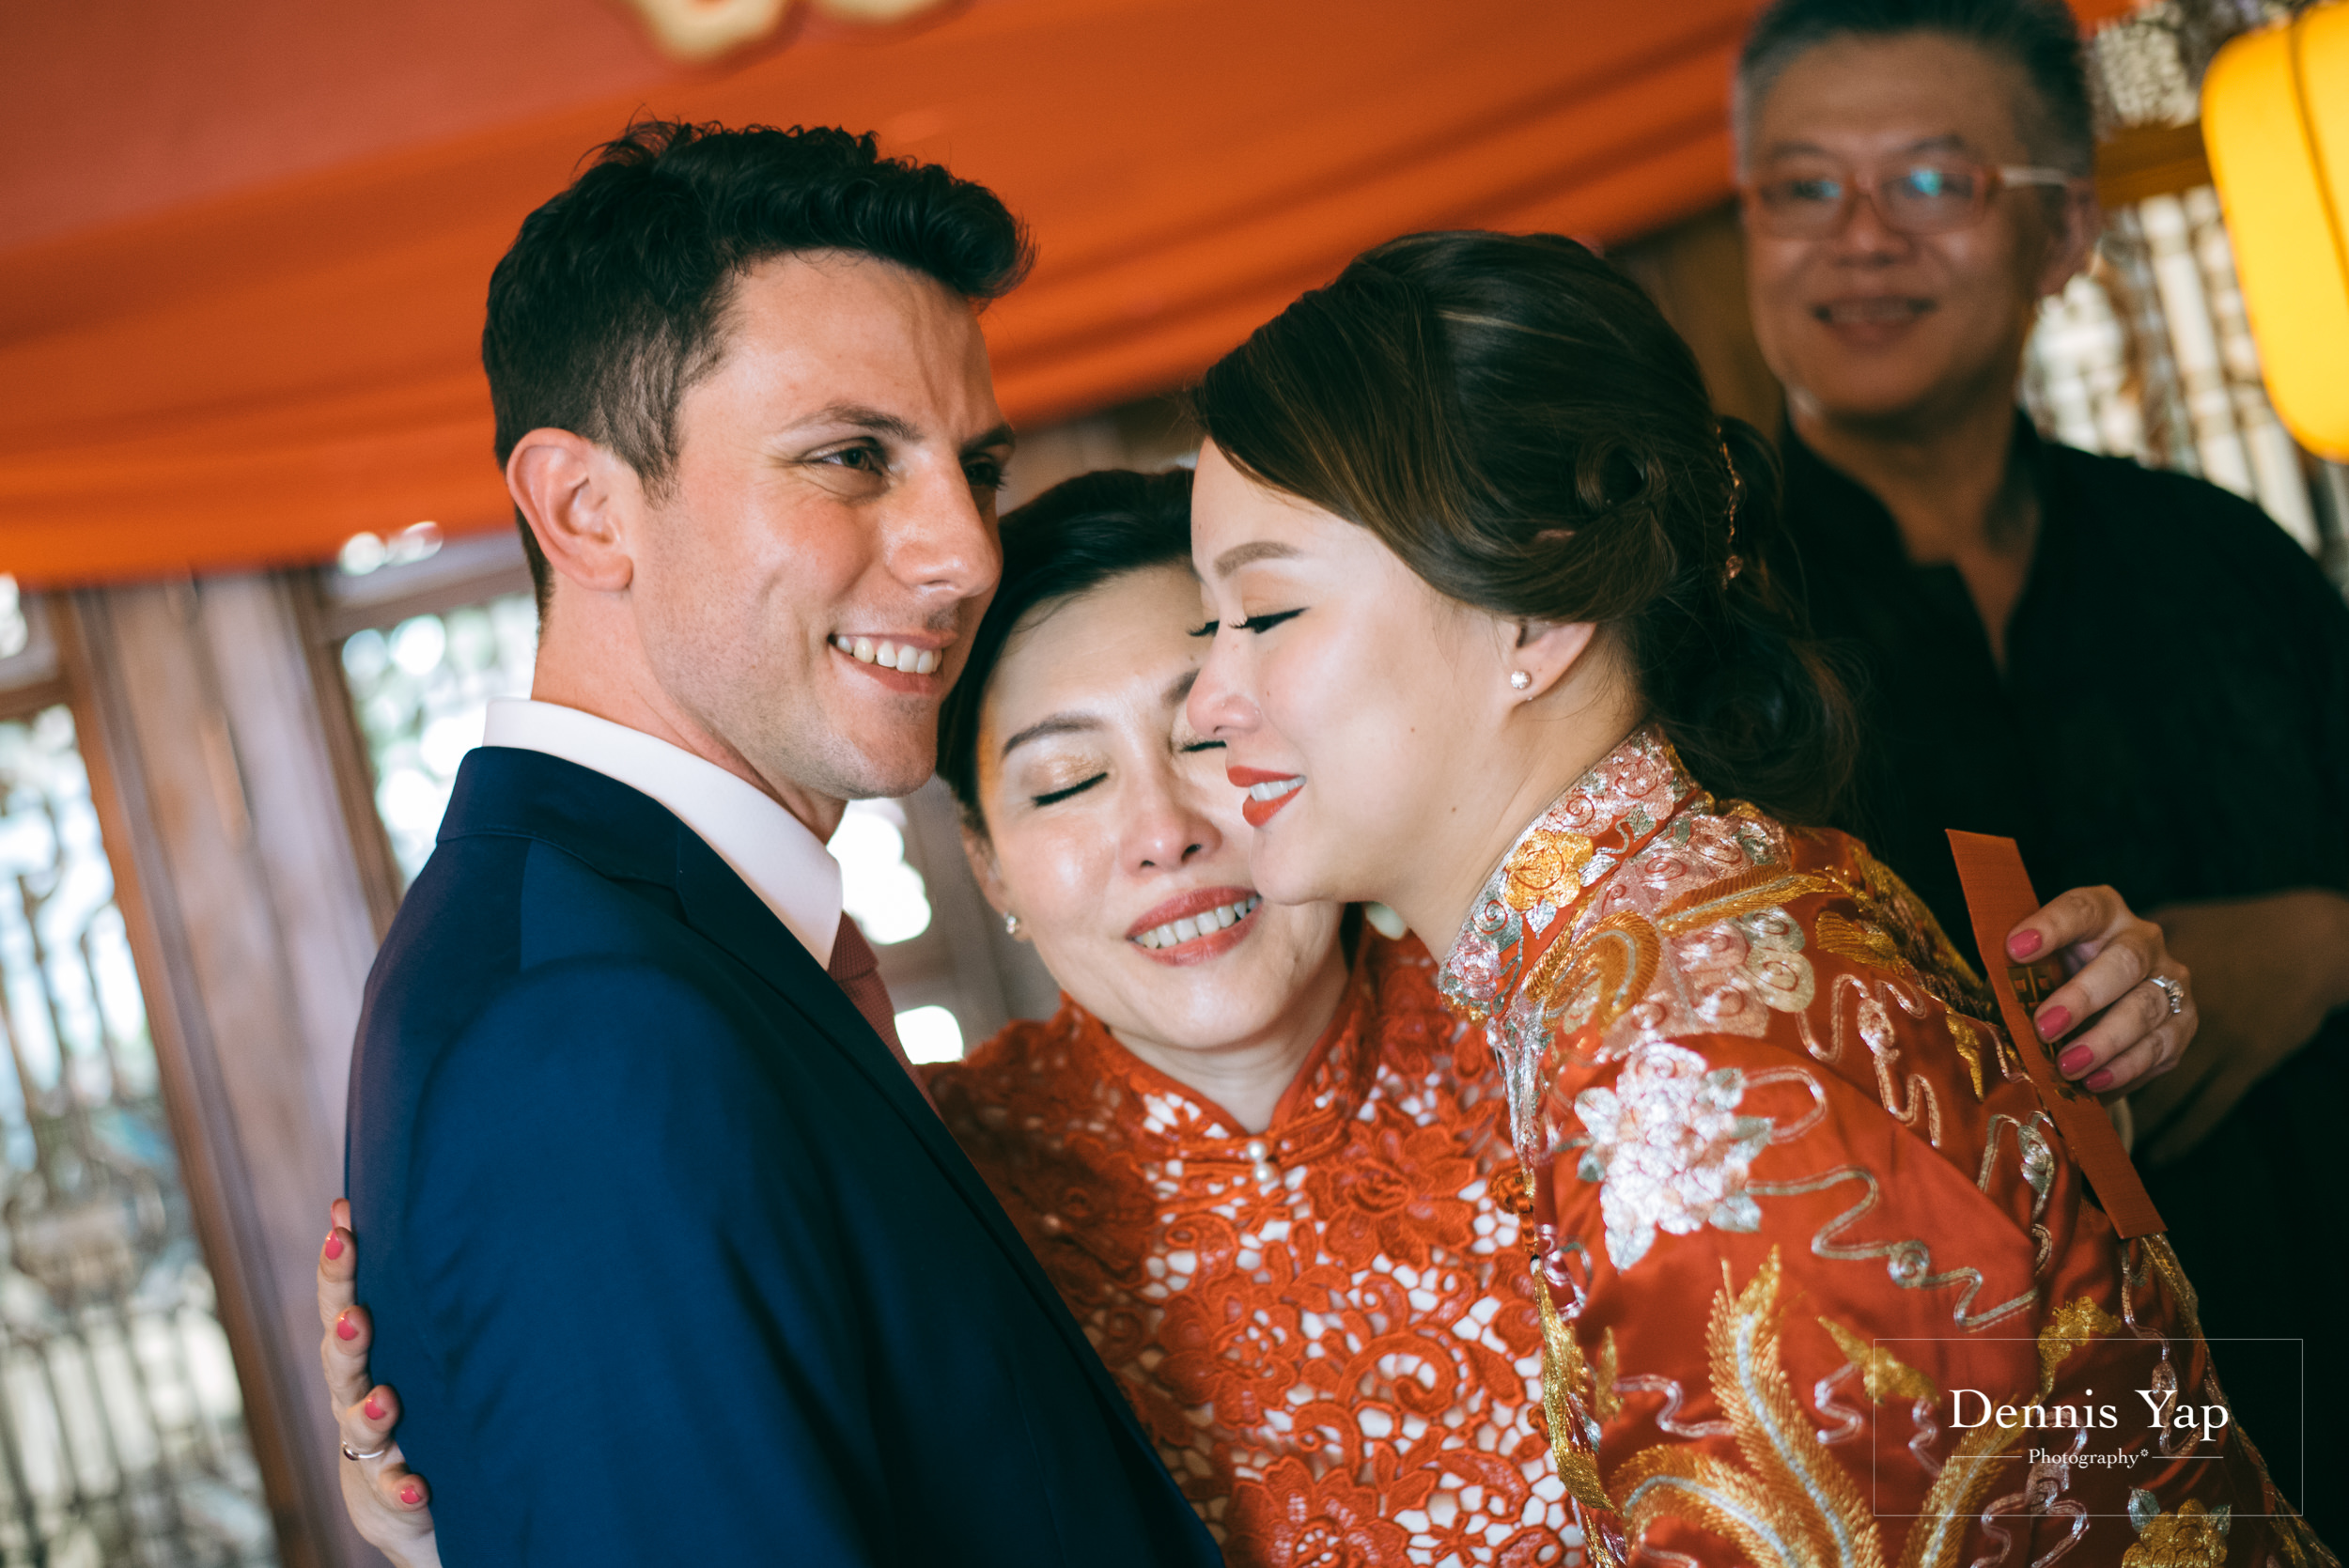 jordan amanda wedding day westin hotel kuala lumpur choe family dennis yap photography-16.jpg